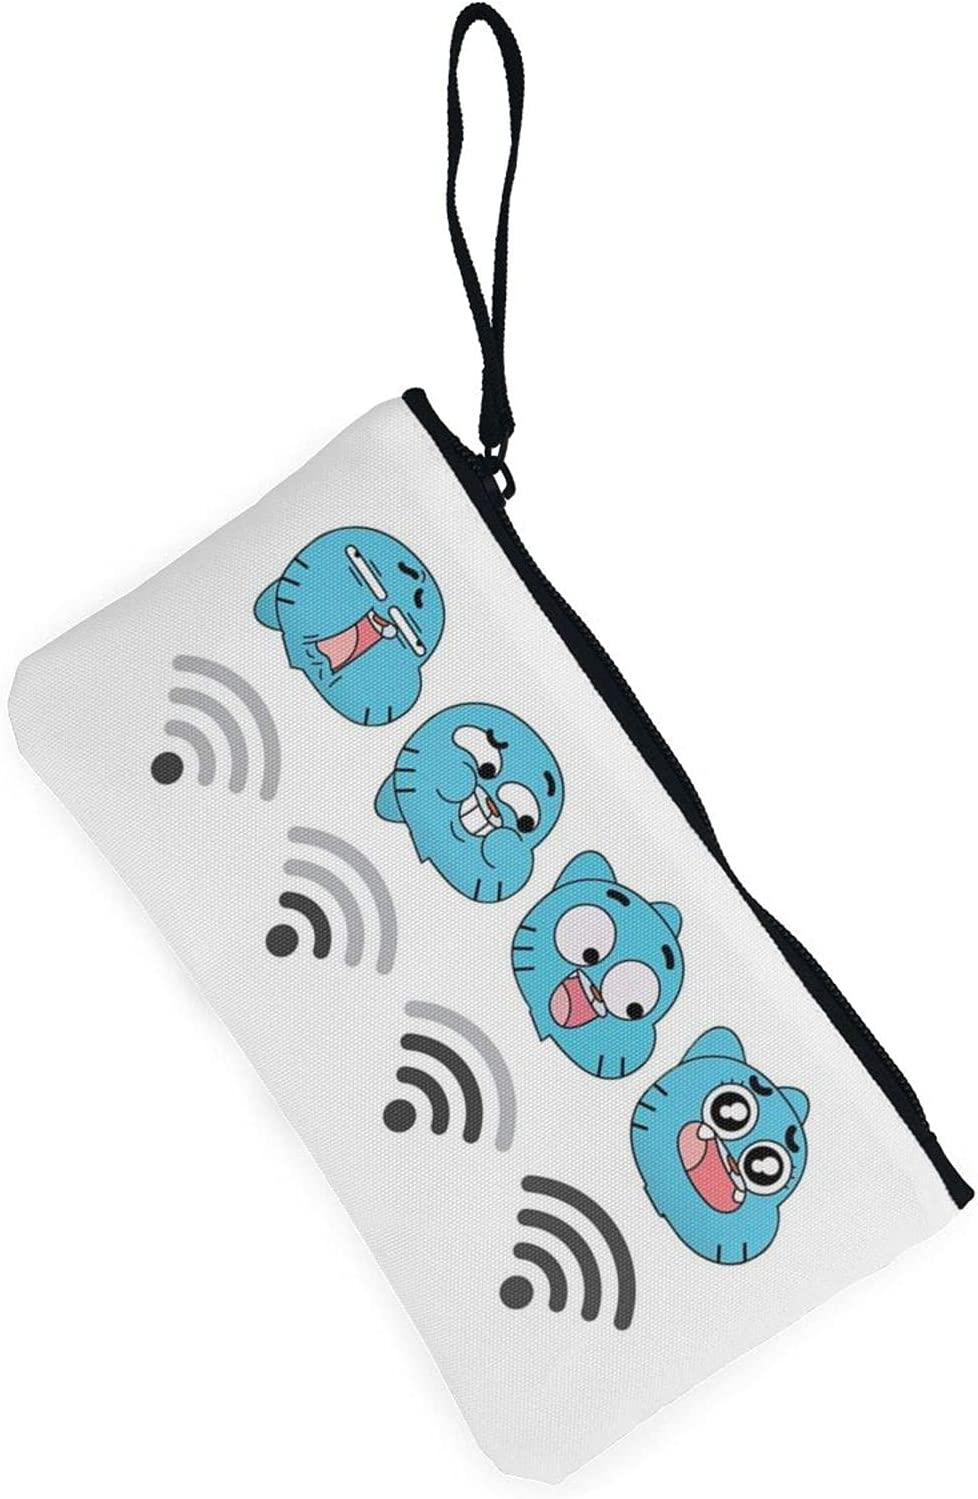 AORRUAM Cute Gumball Emoticons Wifi Canvas Coin Purse,Canvas Zipper Pencil Cases,Canvas Change Purse Pouch Mini Wallet Coin Bag